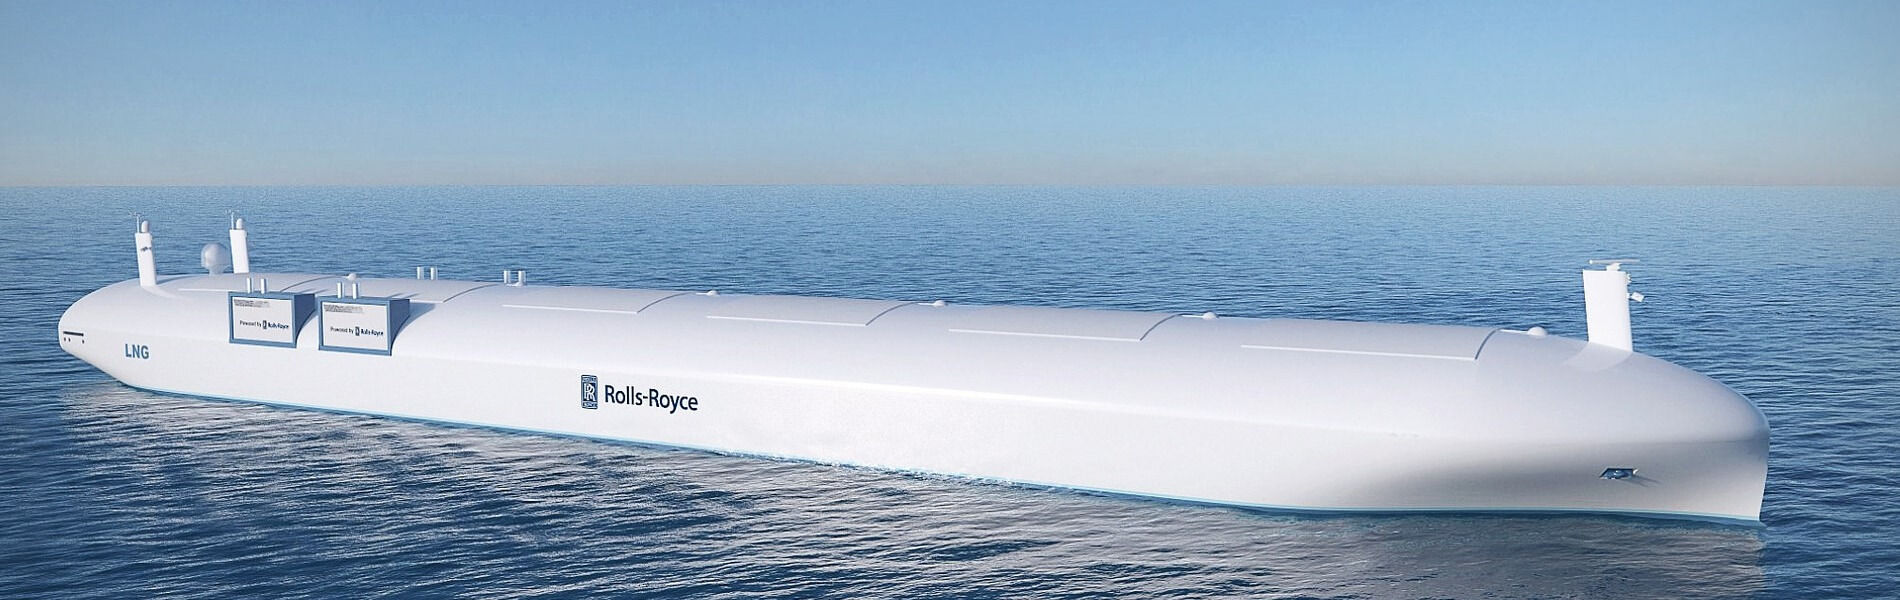 Verkehrsministerium will autonome Schiffe testen